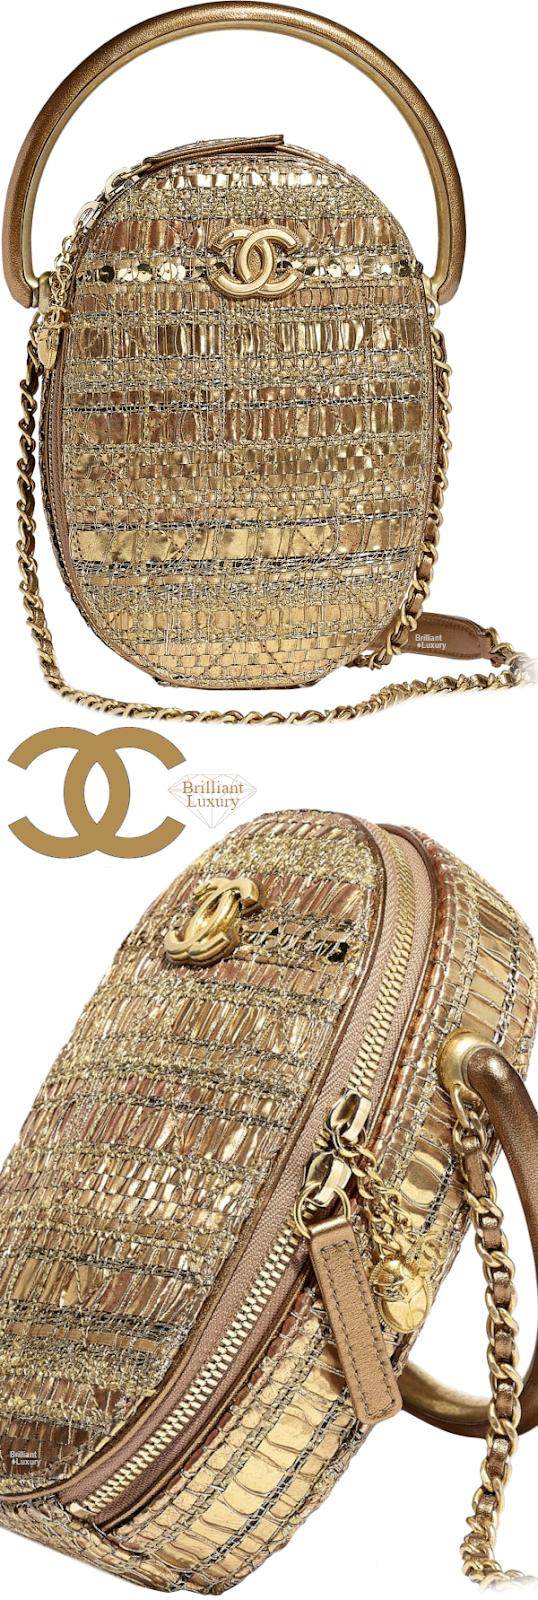 Brilliant Luxury♦Chanel Tweed Camera Case Bag #gold